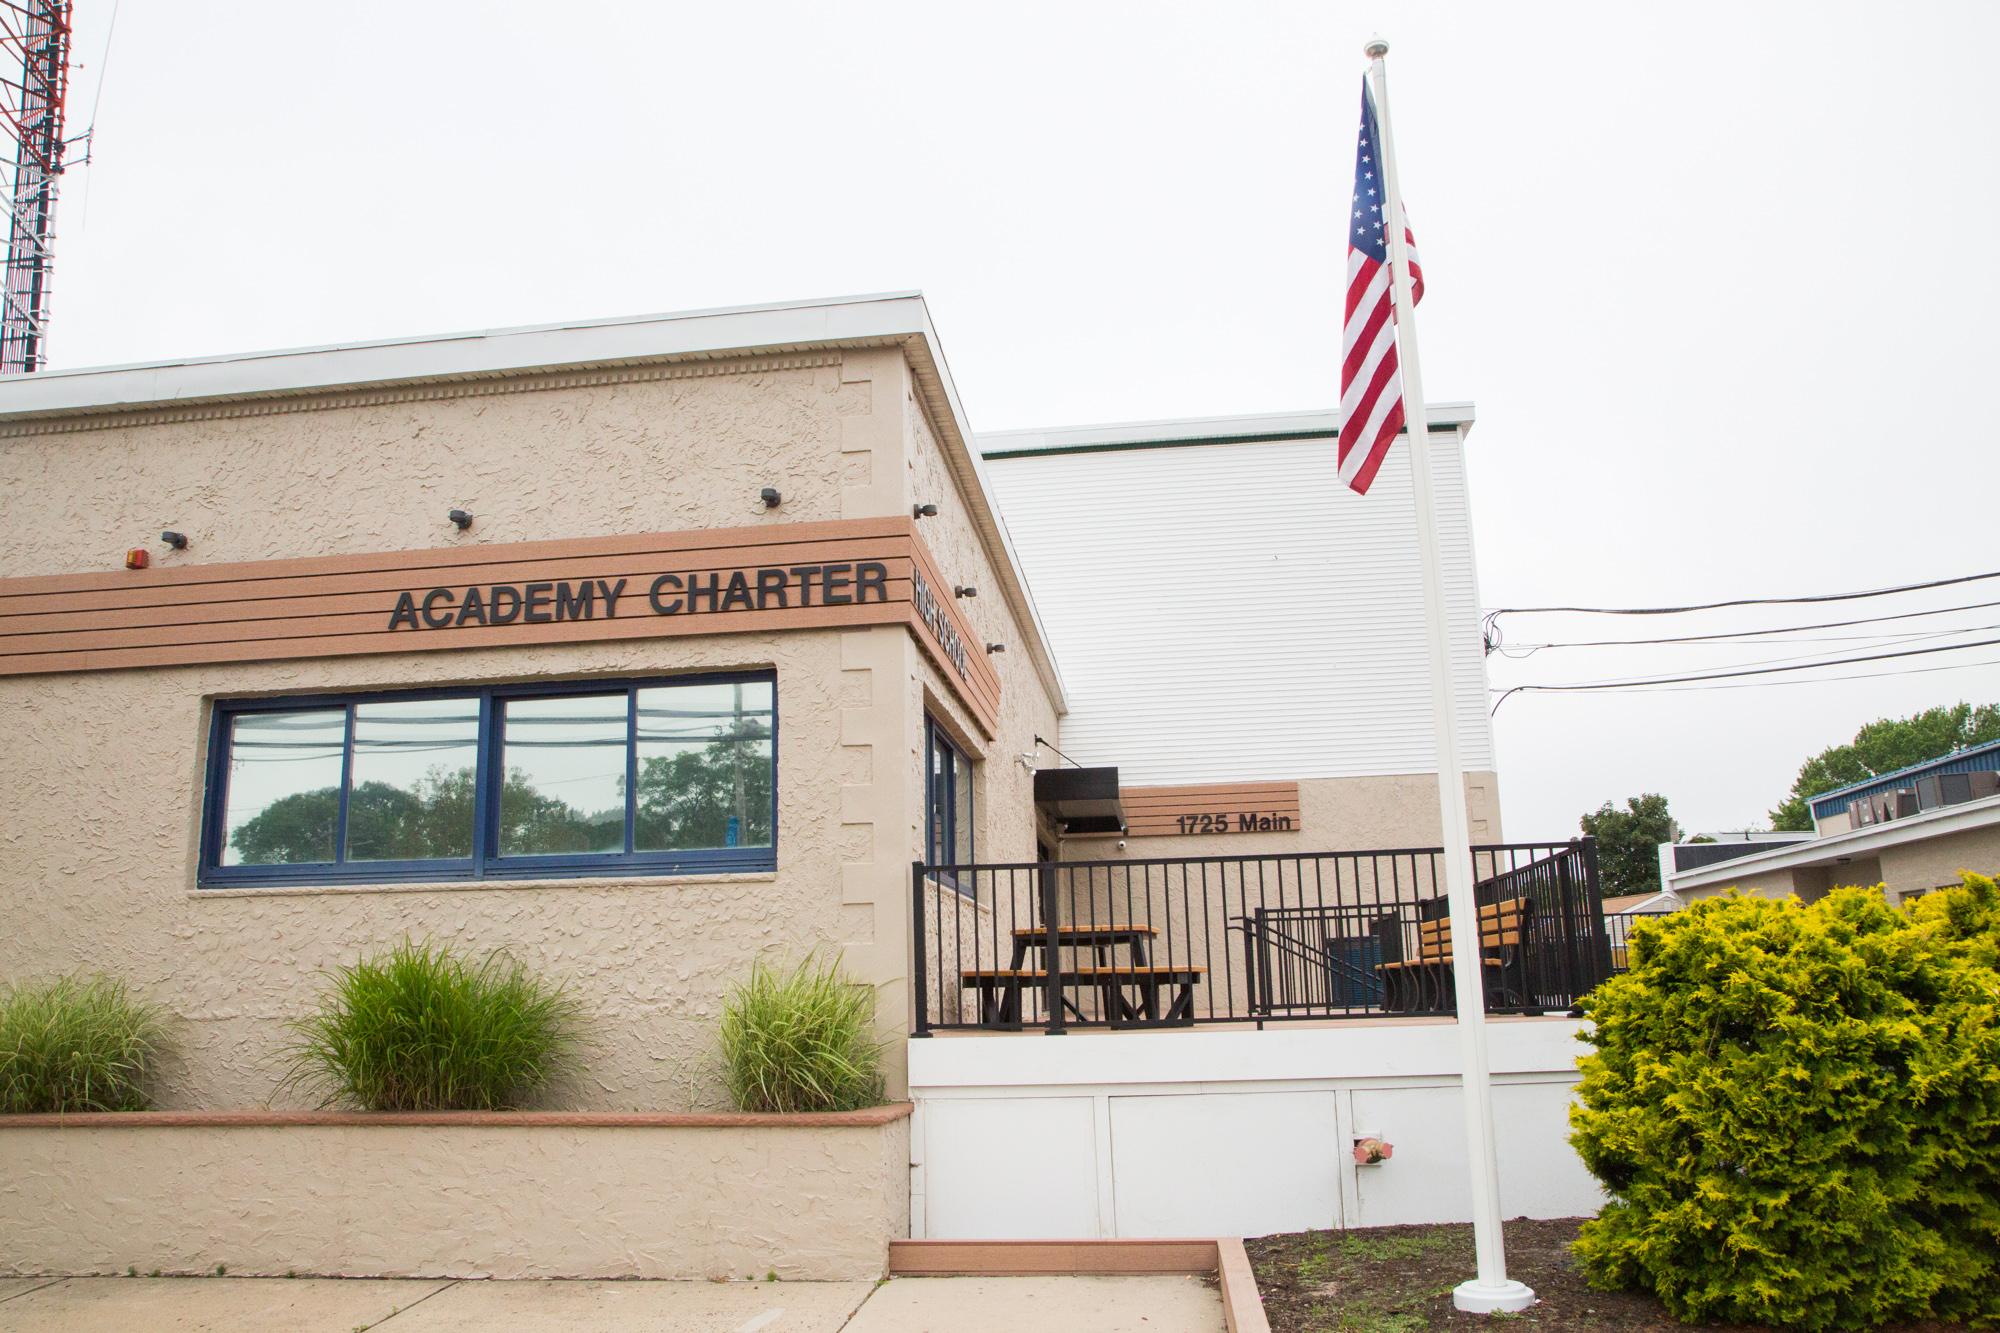 20160624-Academy Charter School_007.jpg